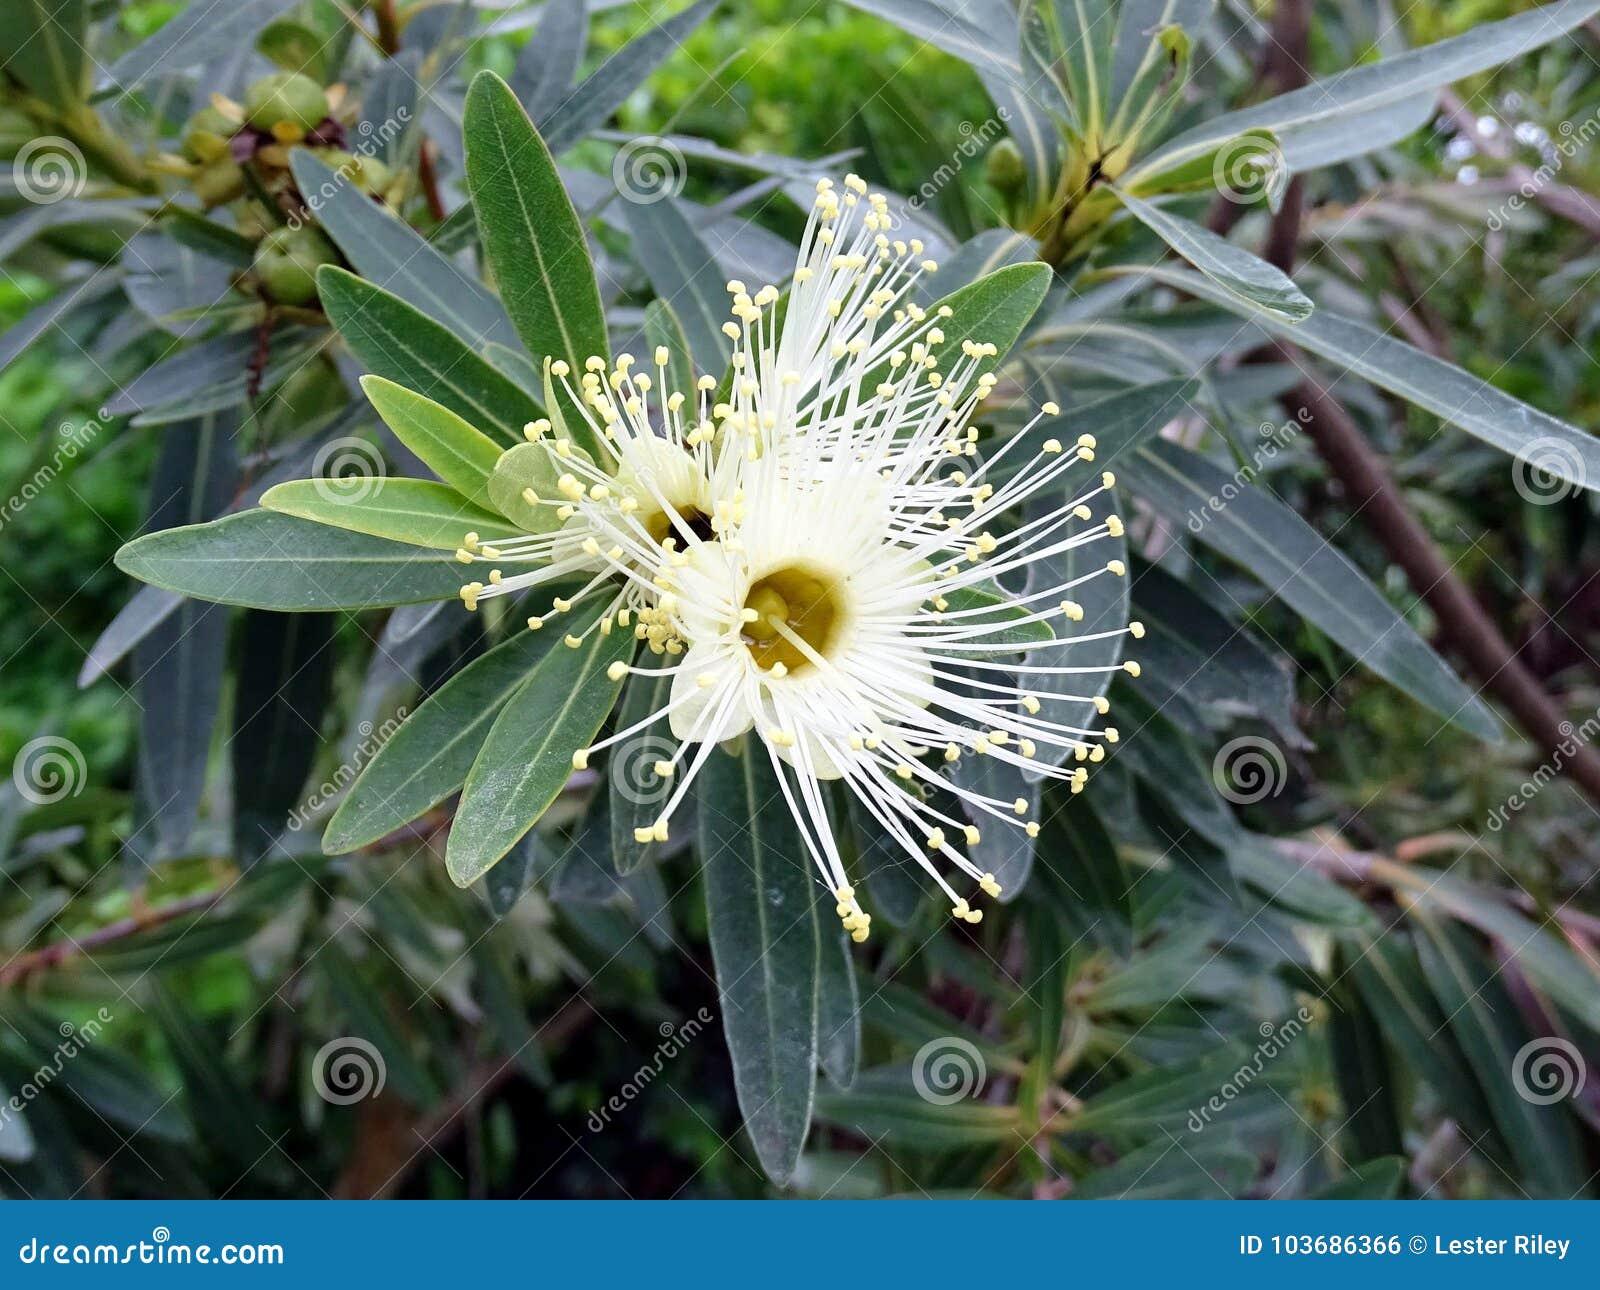 The white flower of a gum tree in full bloom in australia stock the white flower of a gum tree in full bloom in australia mightylinksfo